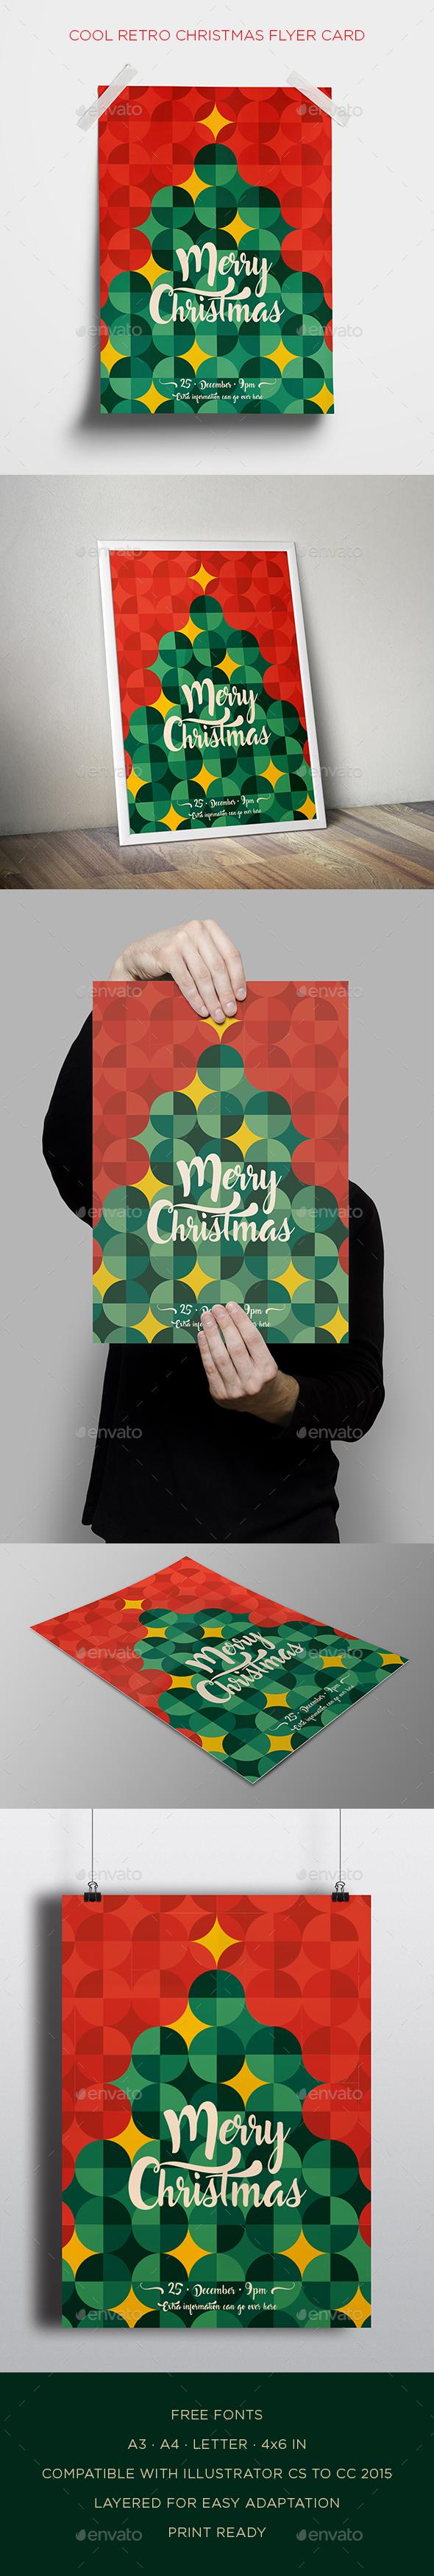 Cool Retro Christmas Flyer Card